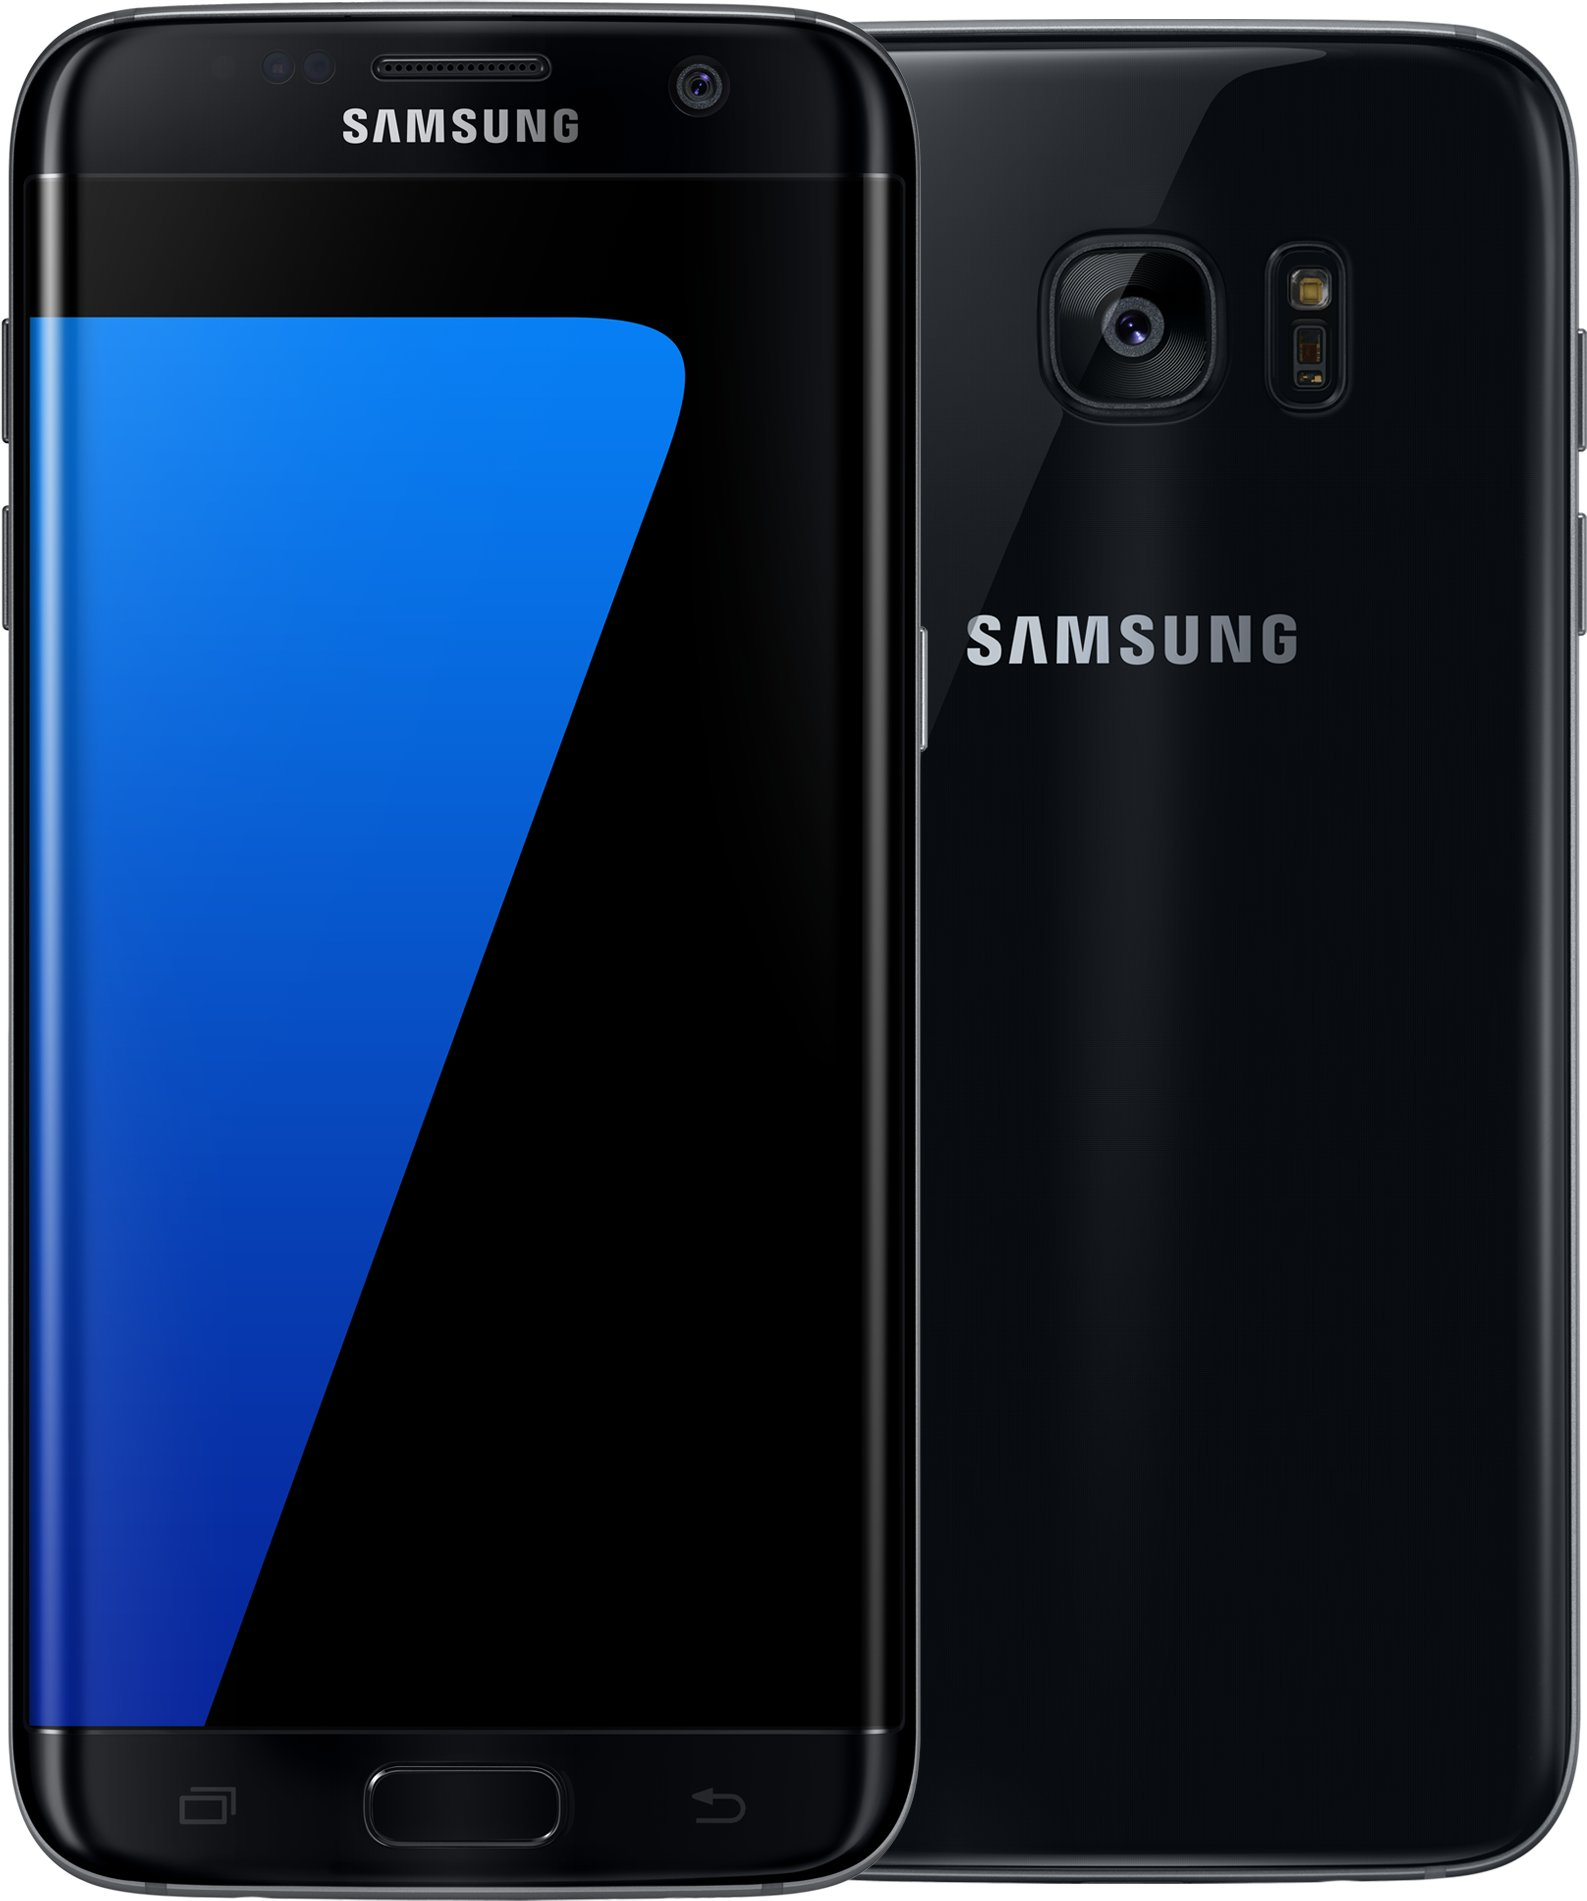 Samsung Galaxy S7 Edge Black Onyx - 32GB